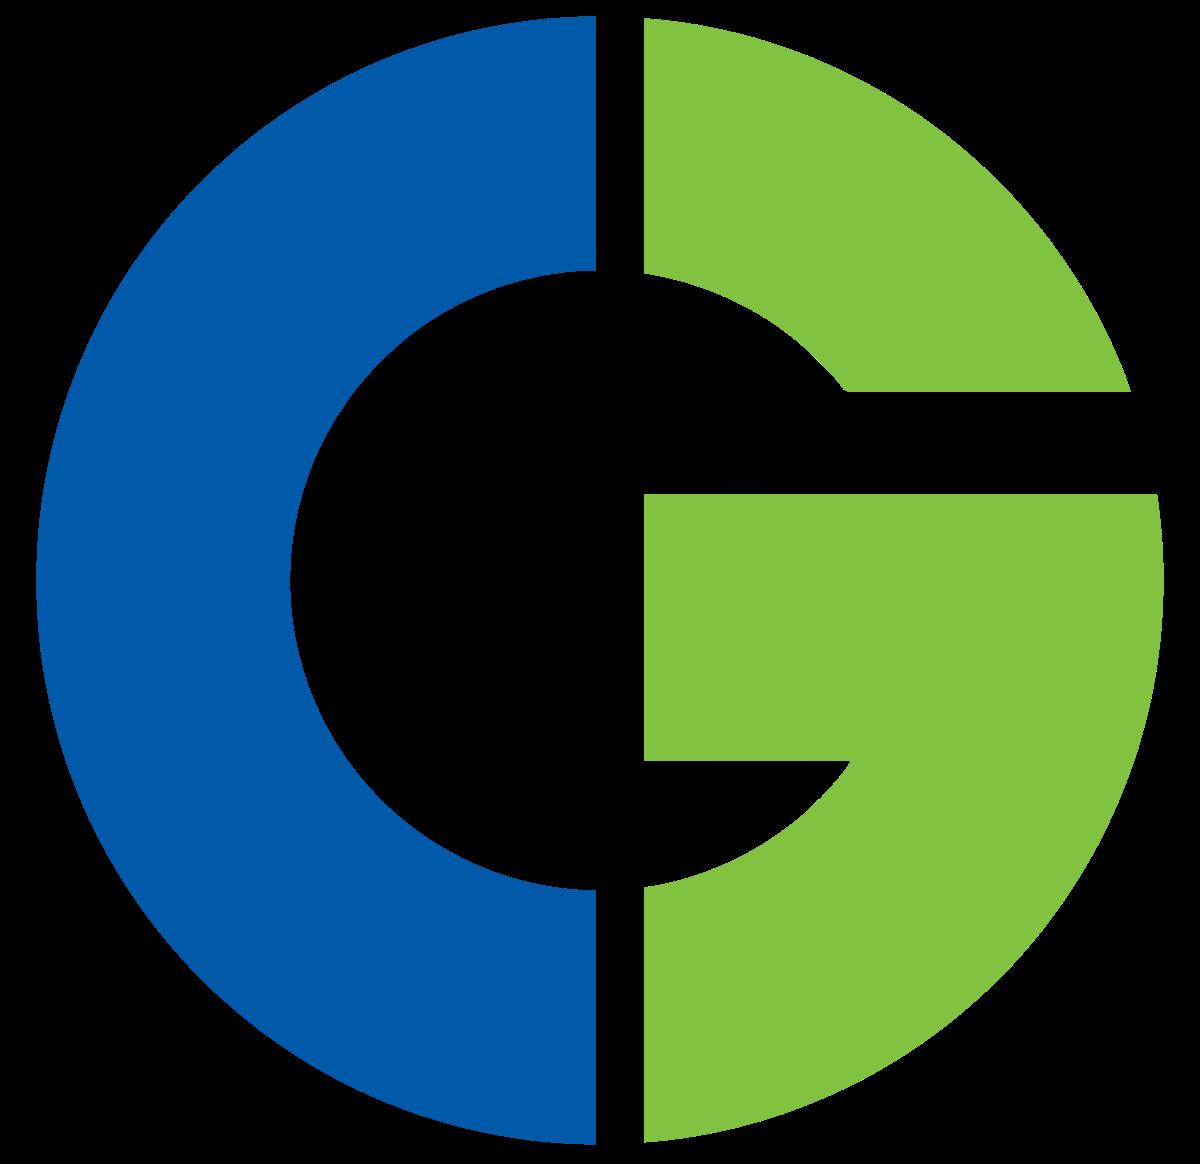 Crompton Greaves Ltd